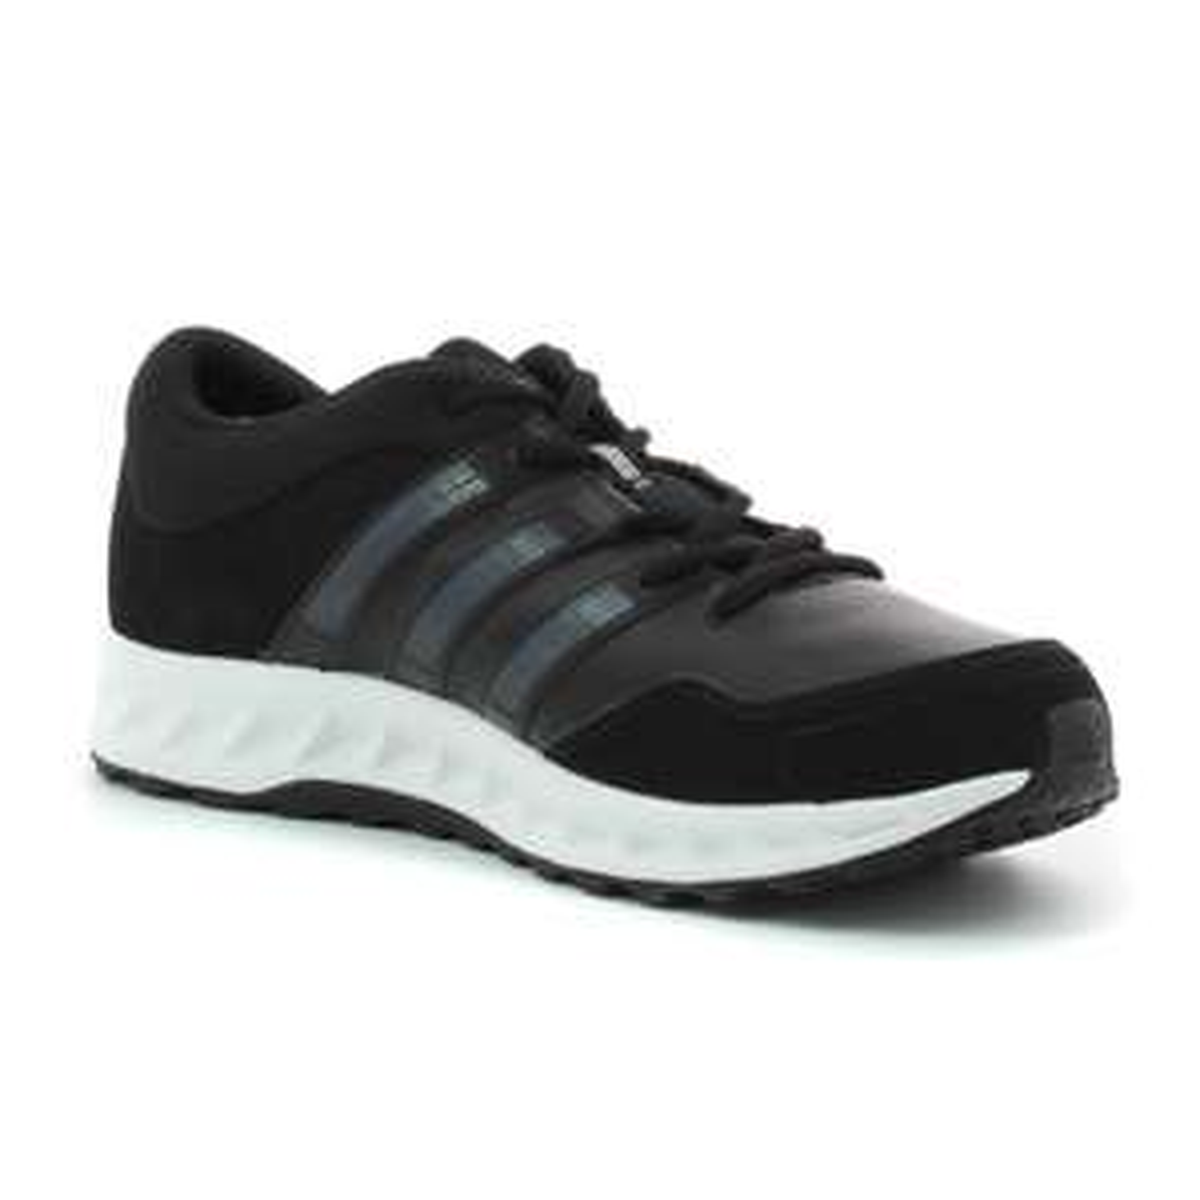 Chaussure running Adidas Sl Falcon Elite 2 (du 42 au 47)